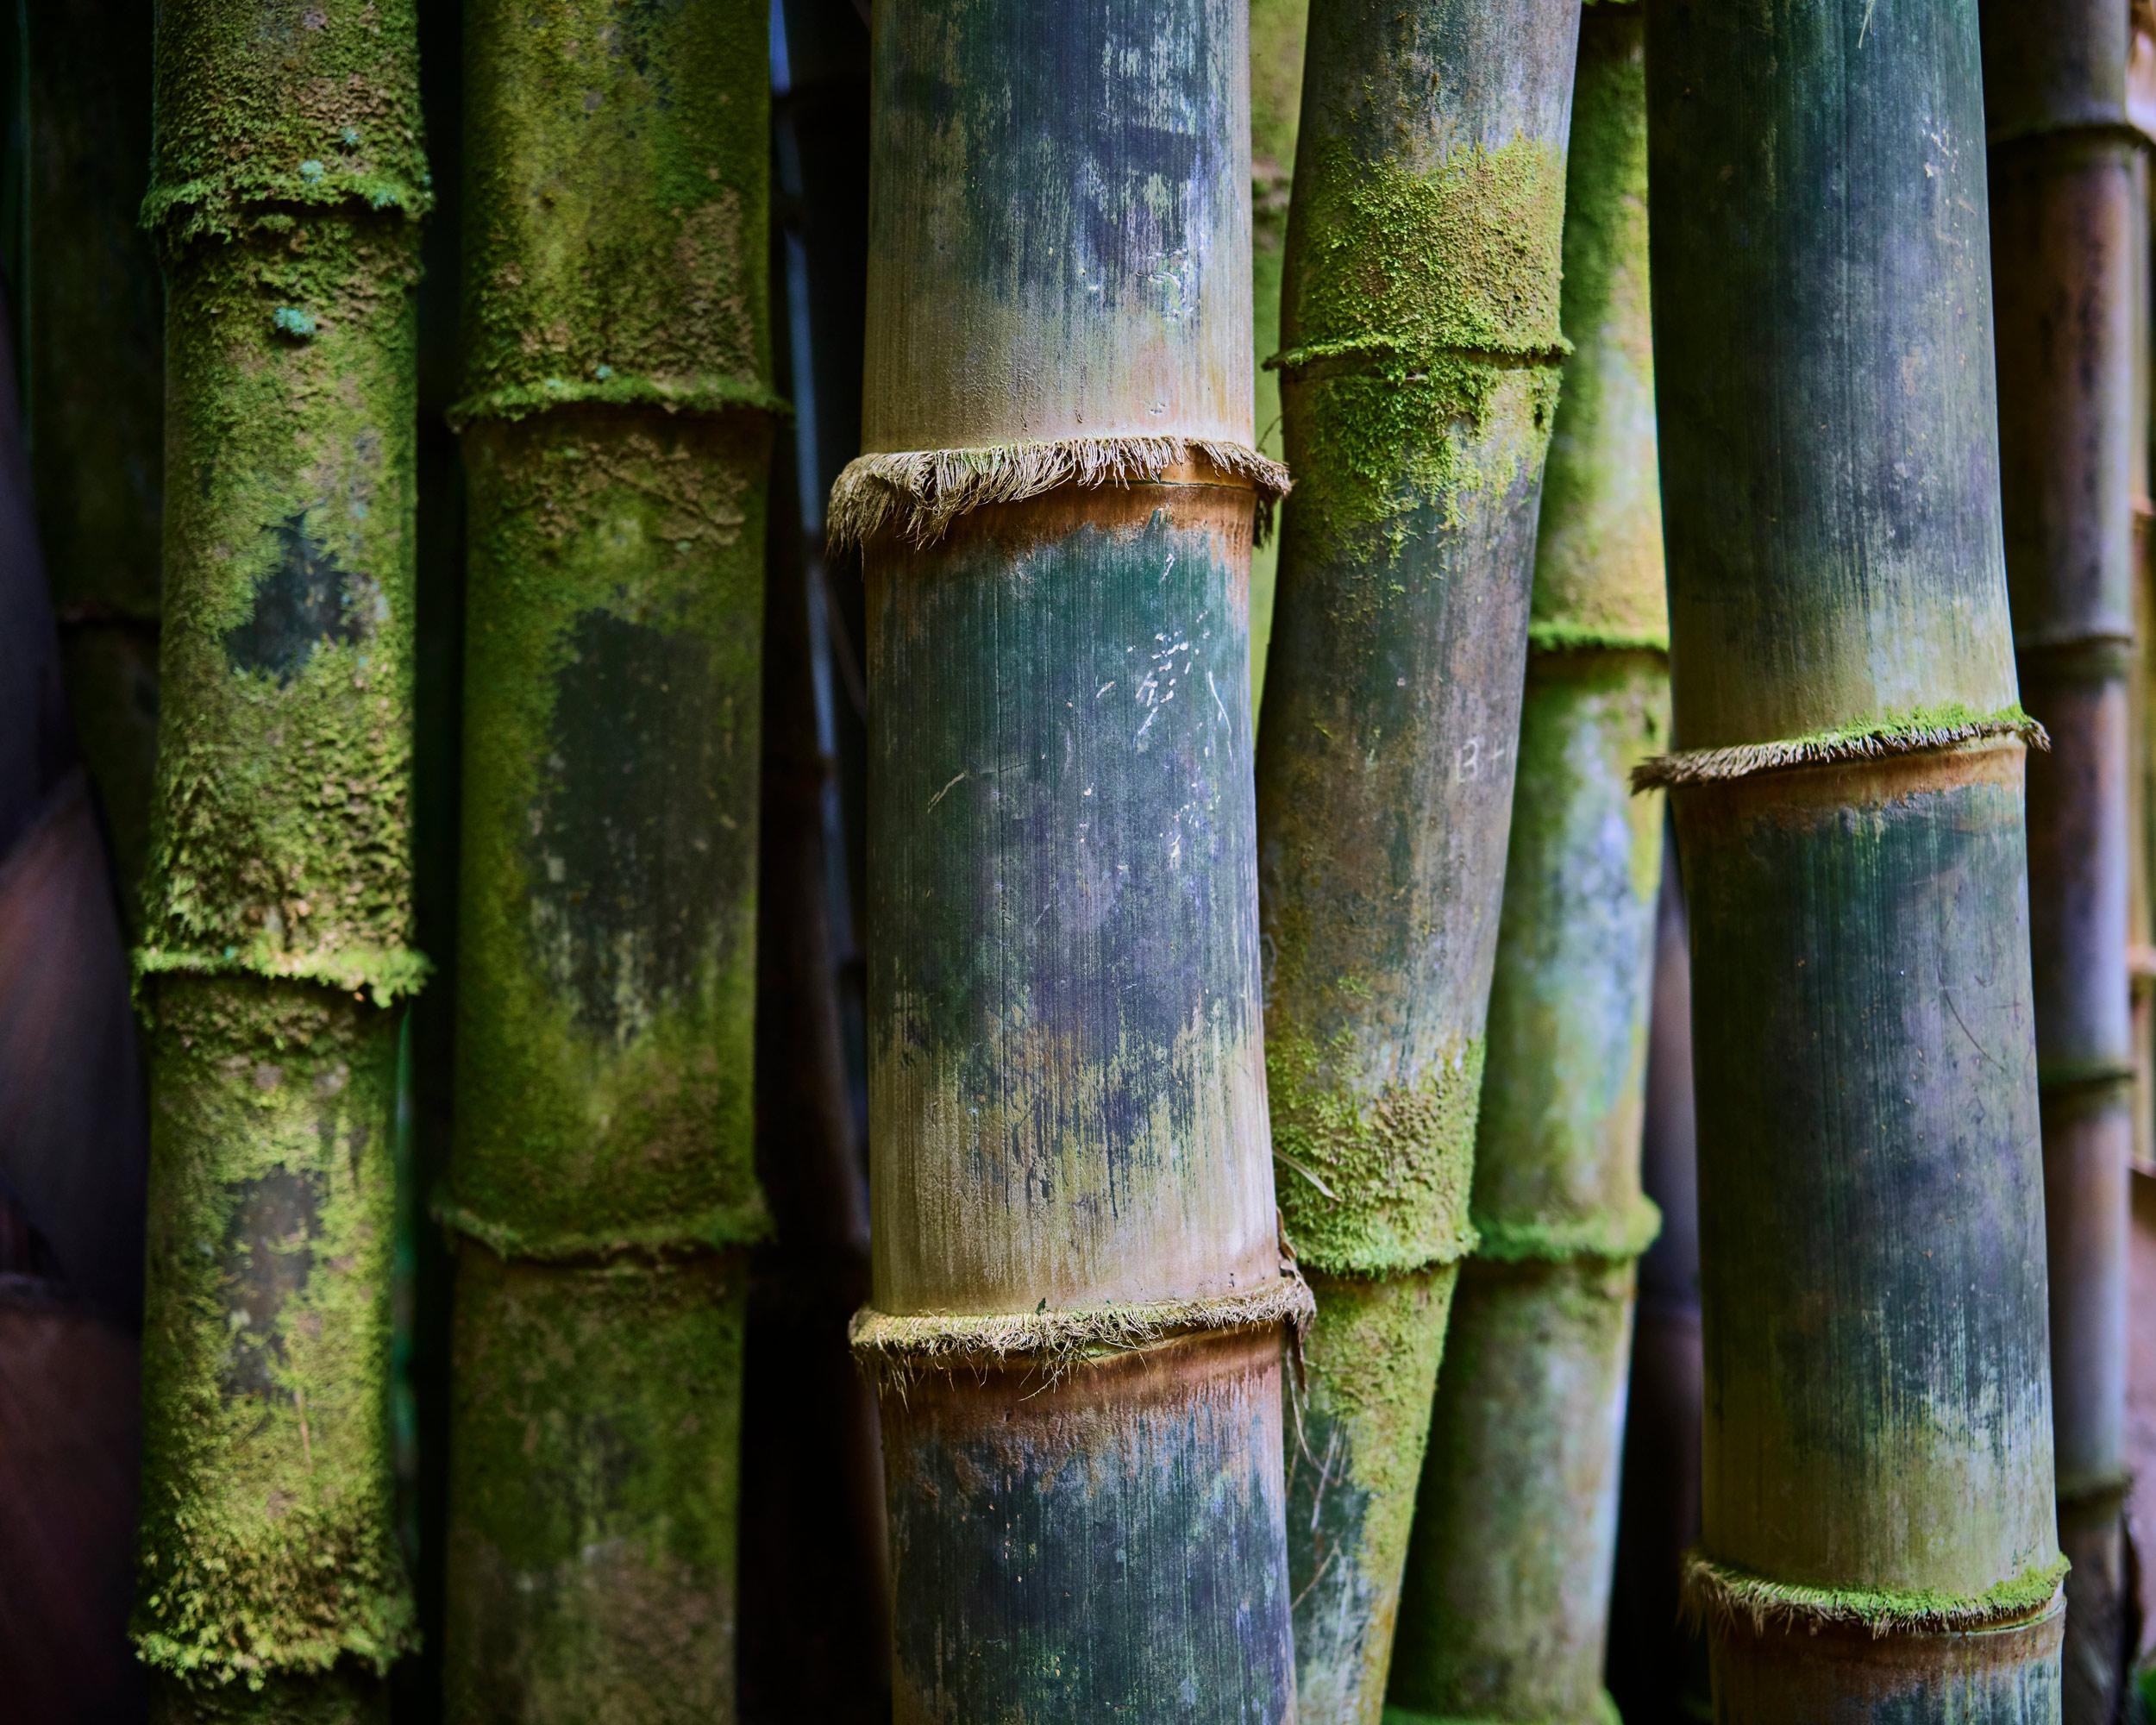 Bamboo in Maui, HI